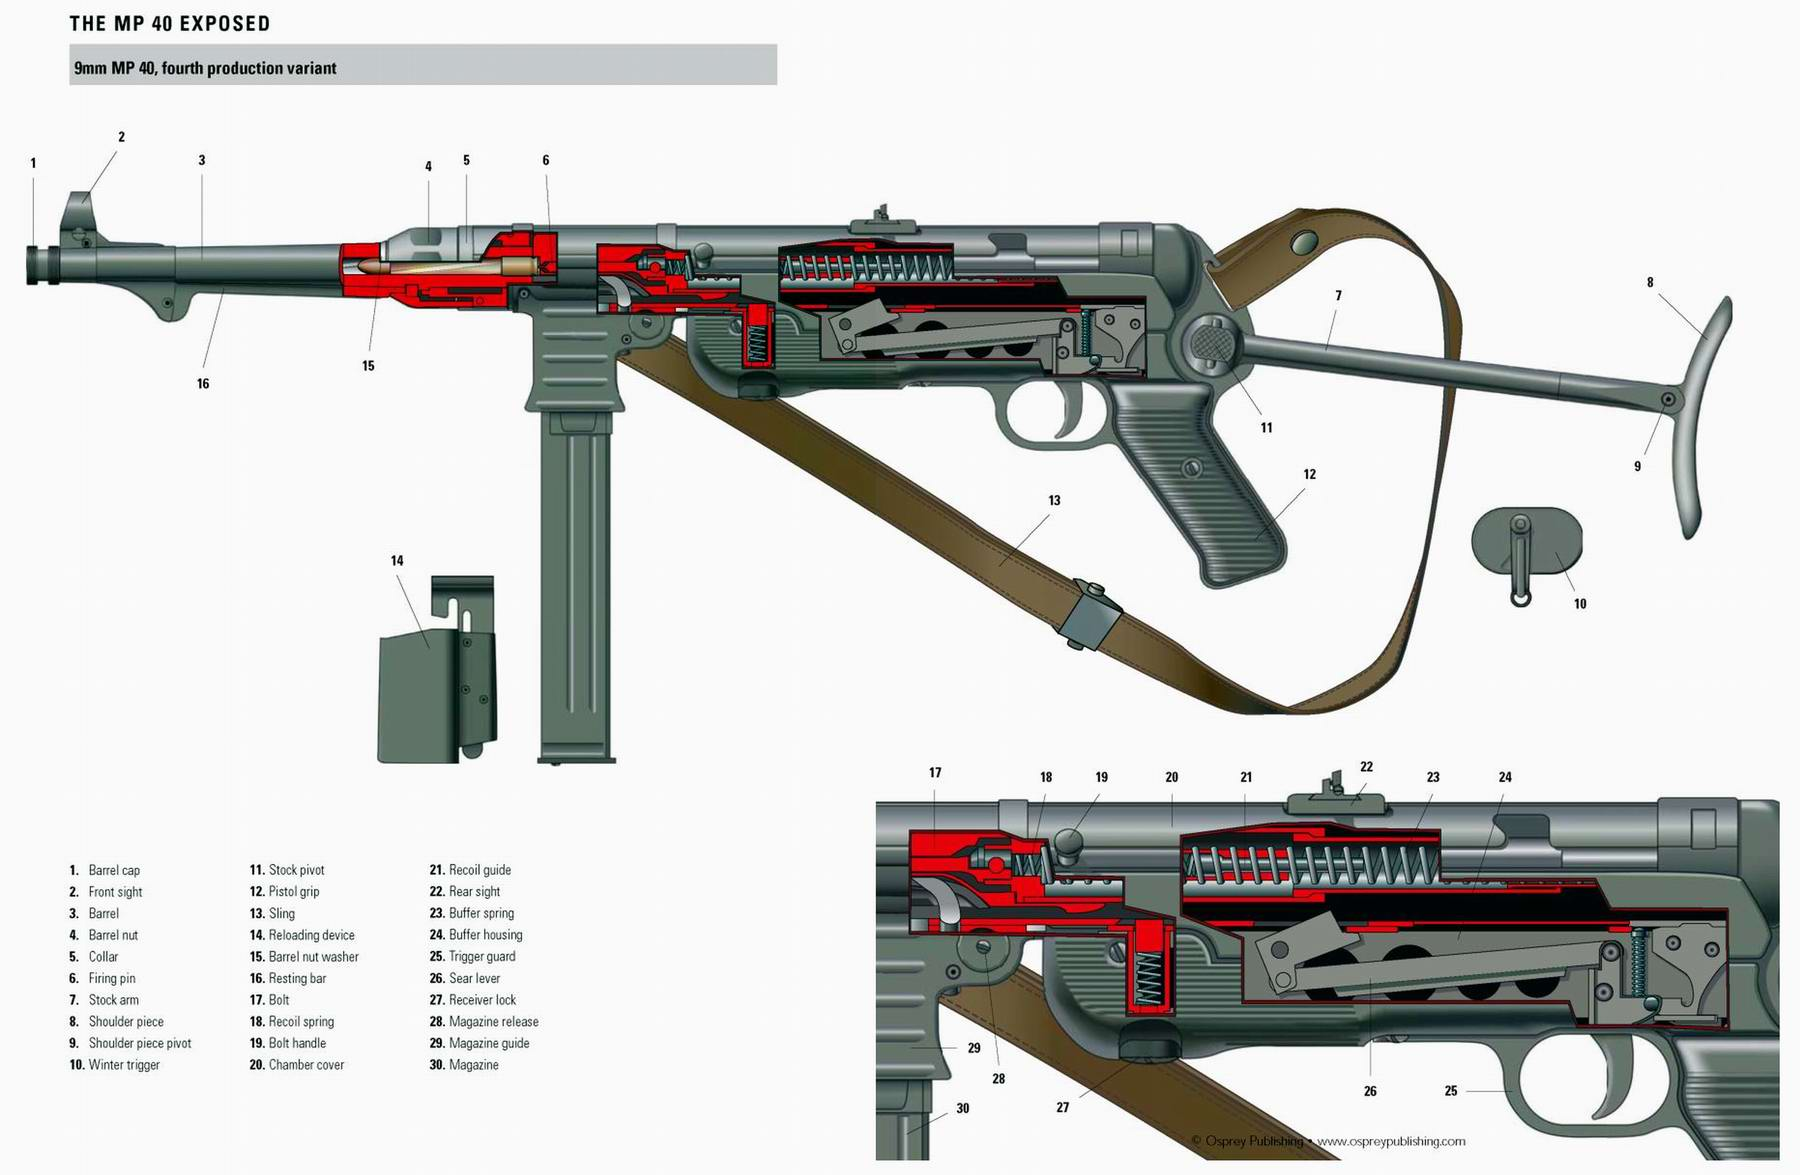 MP 40 - пистолет-пулемет образца 1940 года (Германия)